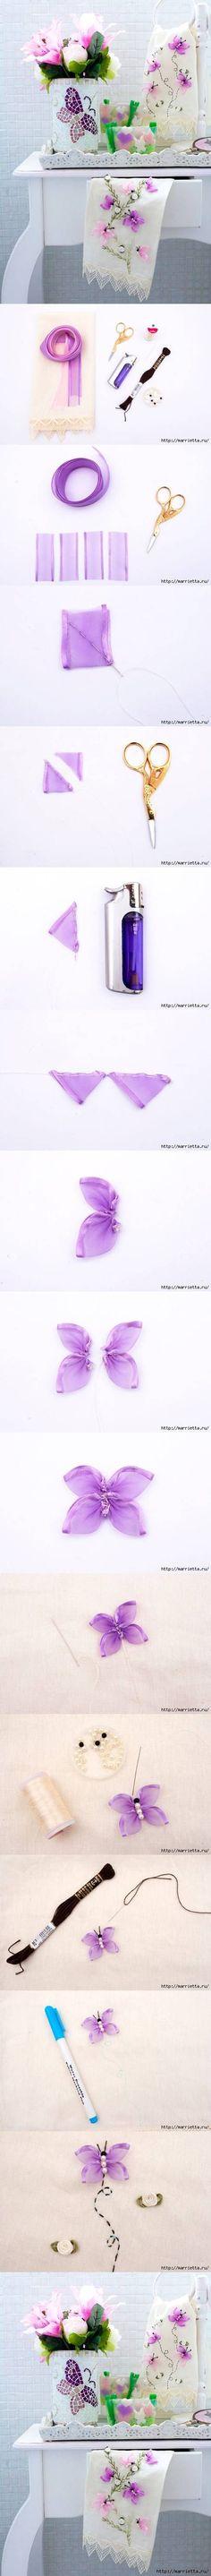 DIY Beautiful Embroidered Ribbon Butterfly | iCreativeIdeas.com LIKE Us on Facebook ==>